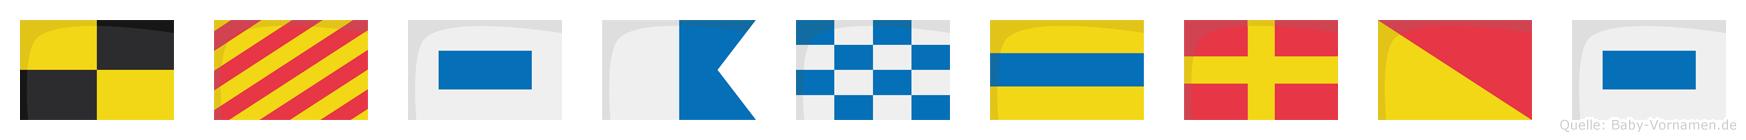 Lysandros im Flaggenalphabet